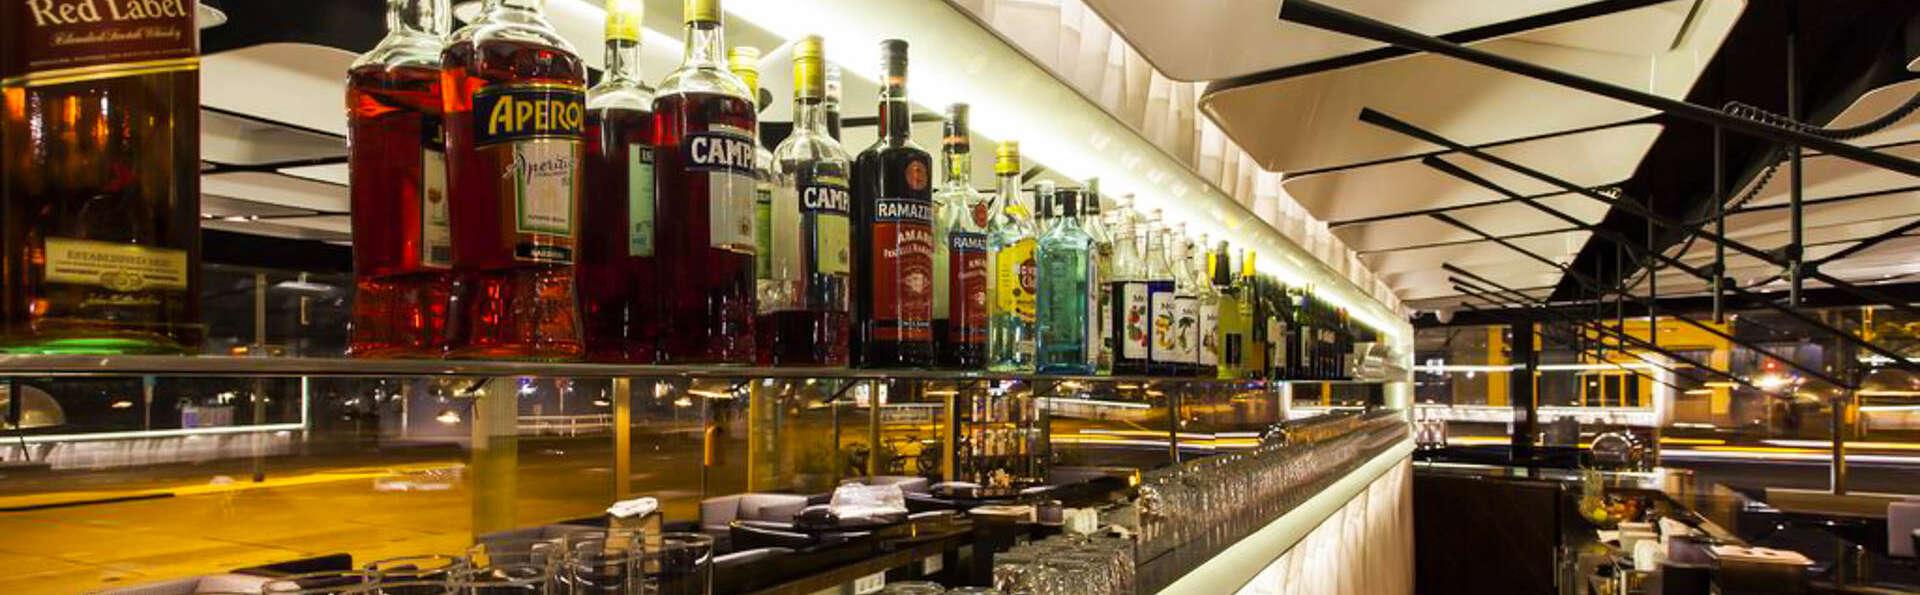 Quentin Boutique Hotel - EDIT_BAR2.jpg